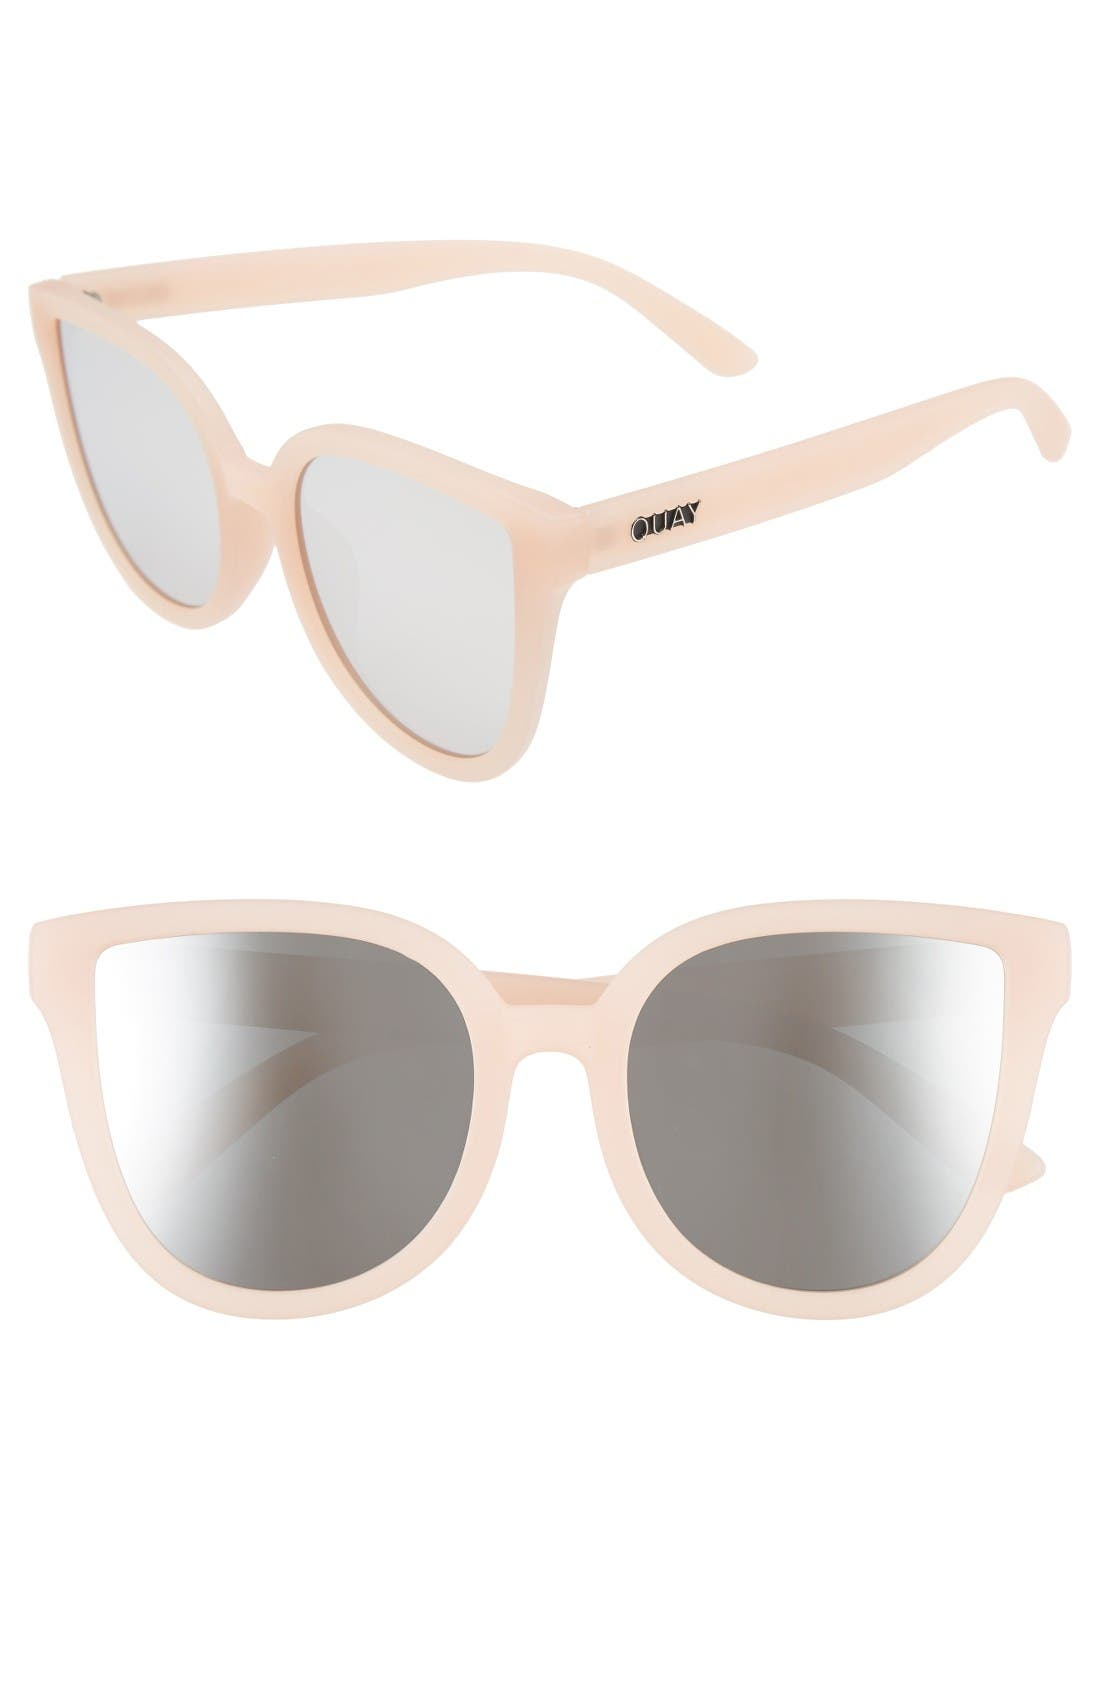 Alternate Image 1 Selected - Quay Australia Paradiso 52mm Cat Eye Sunglasses